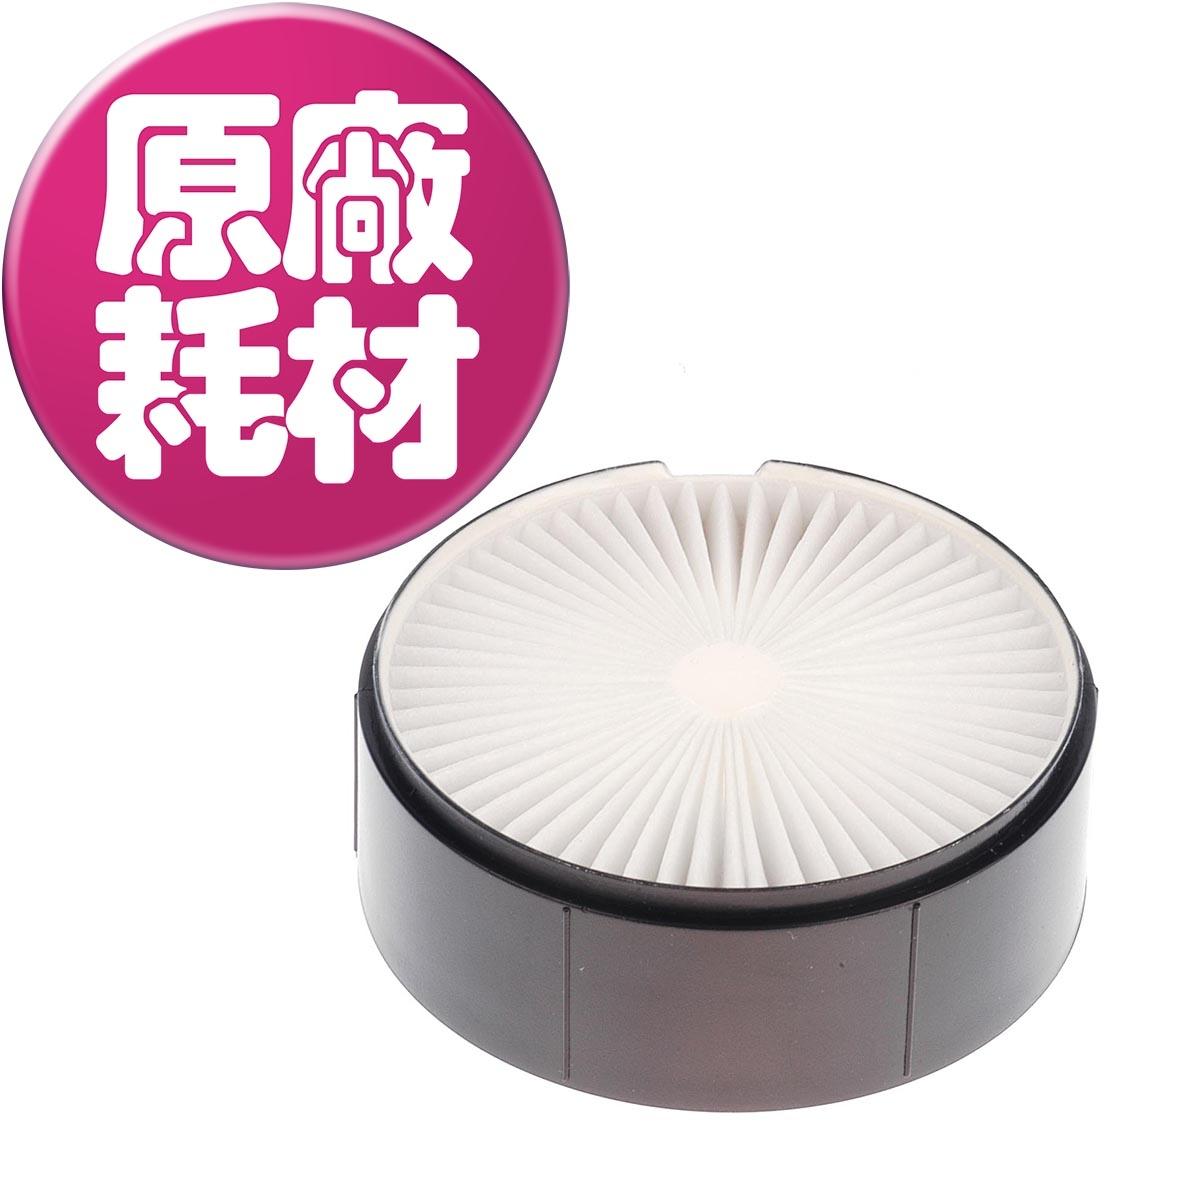 【LG樂金耗材】直立式吸塵器(溼拖升級版) HEPA 濾網